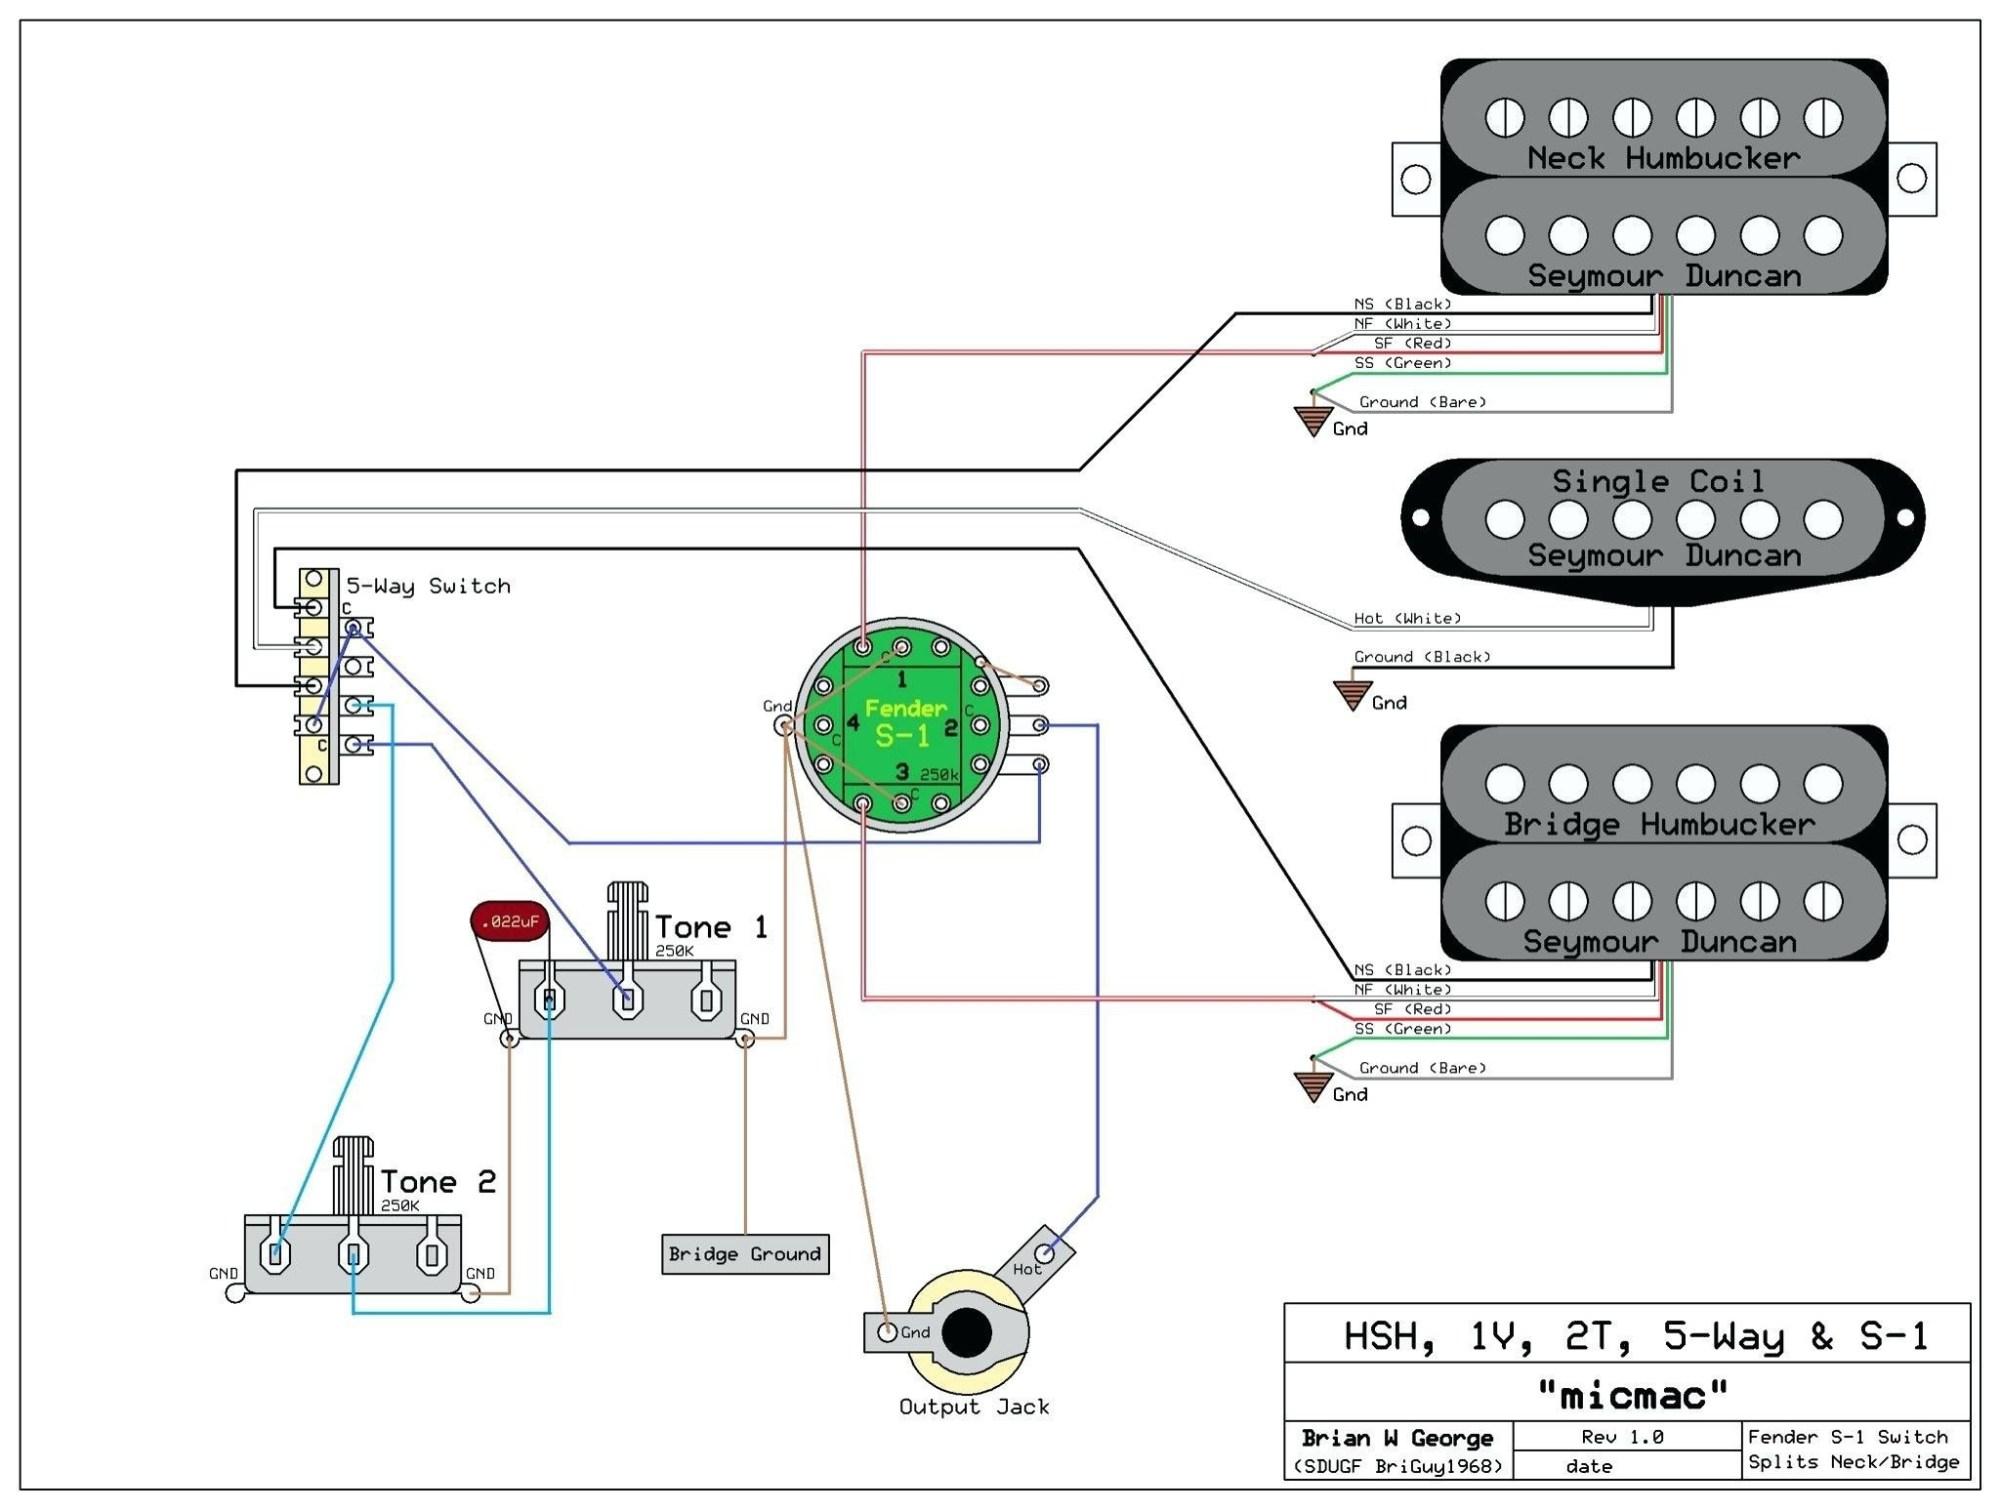 hight resolution of emg sehg wiring diagram wiring diagram yoy emg pickup wiring diagram emg sehg wiring diagram